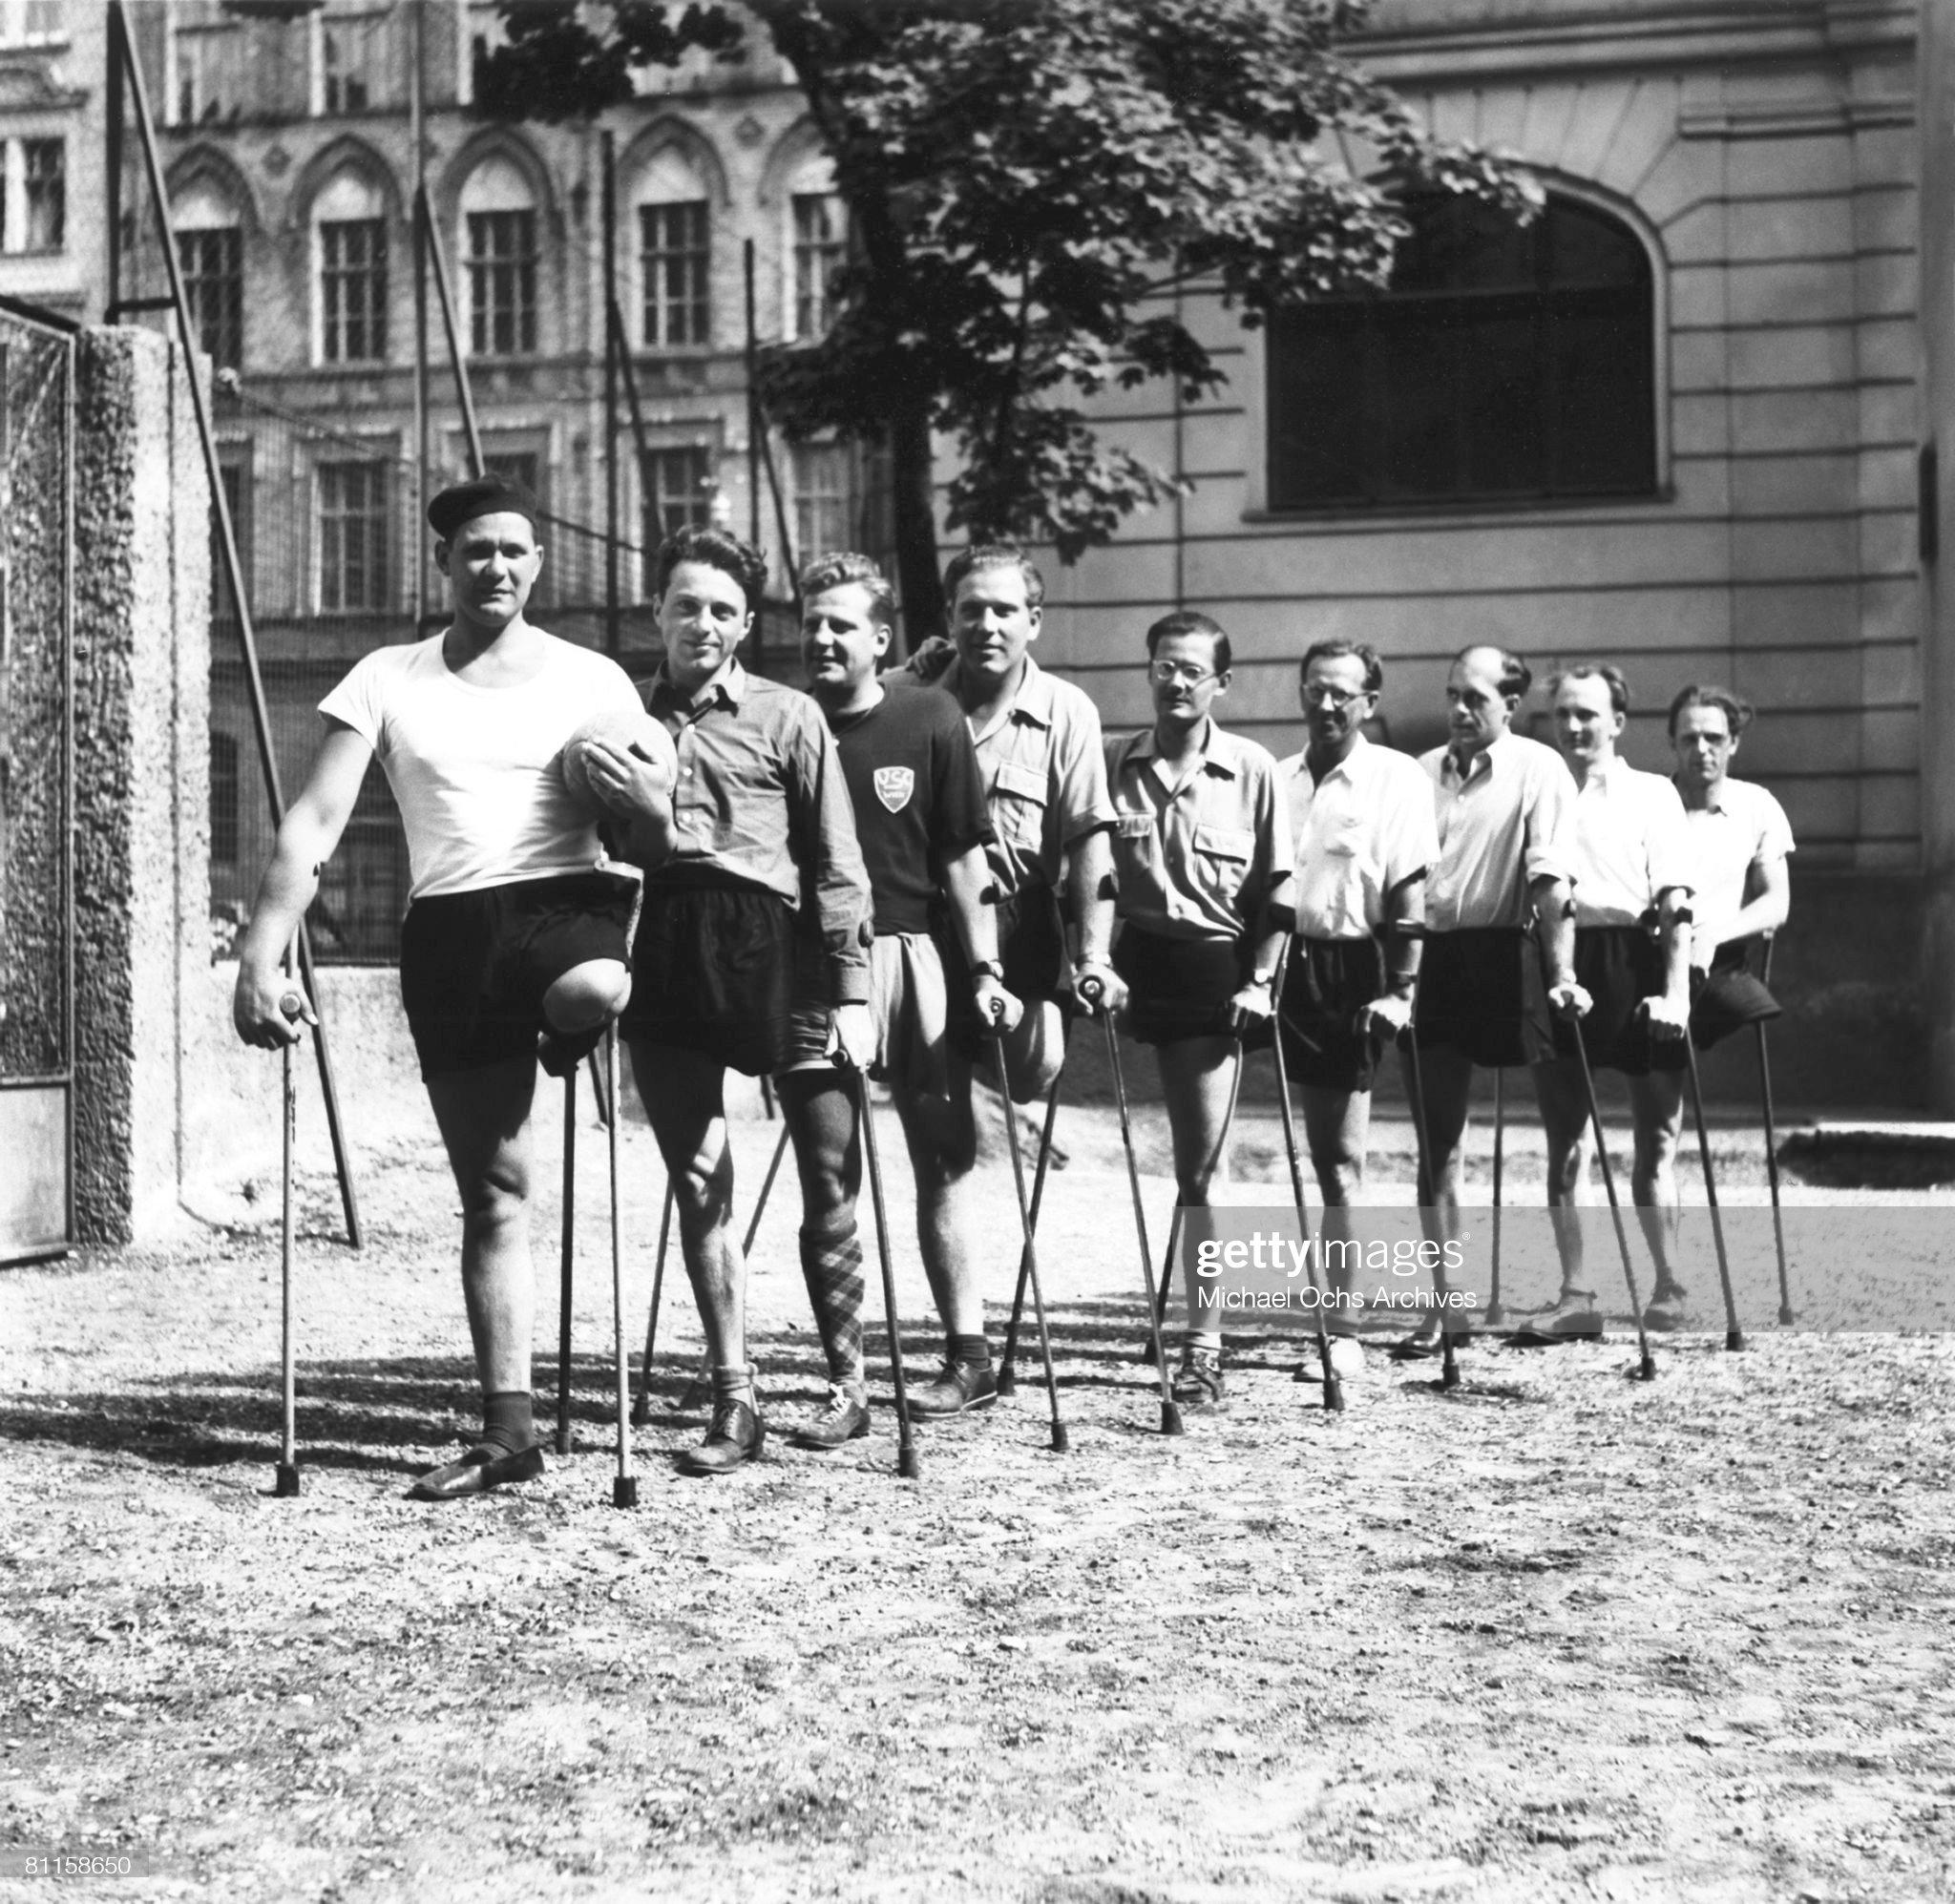 One Legged Soccer Club : News Photo